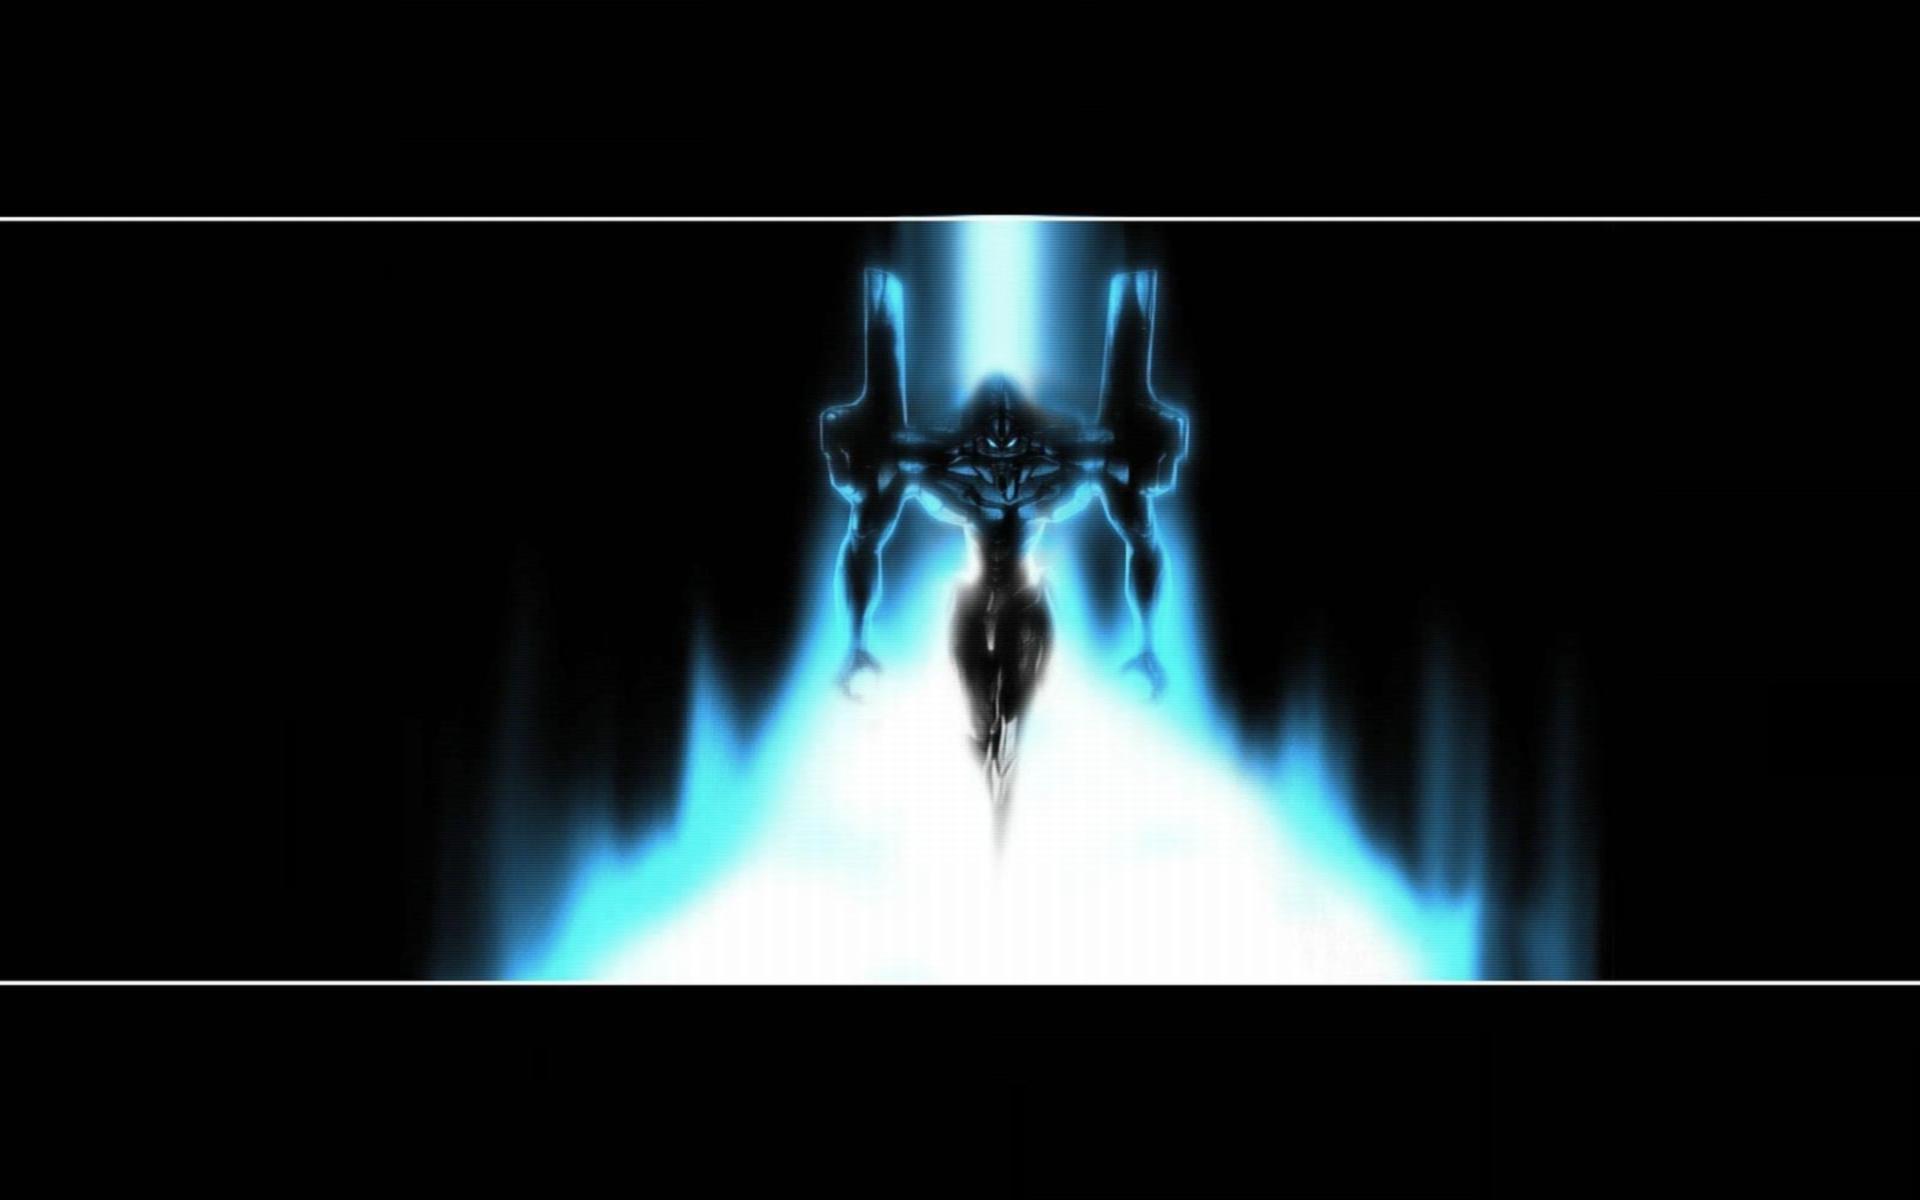 Anime - Neon Genesis Evangelion  Evangelion Wallpaper